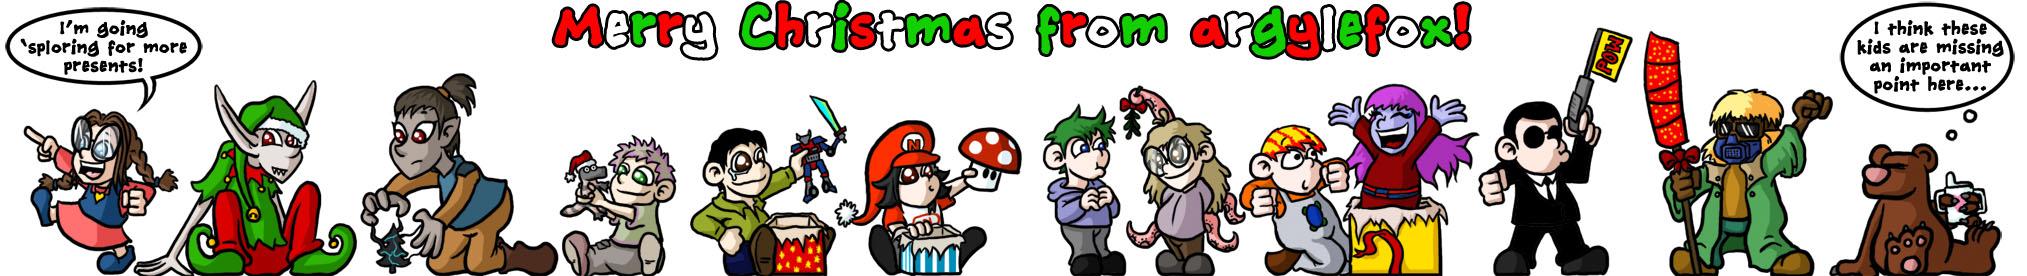 FANART - Christmas Kids by argylefox